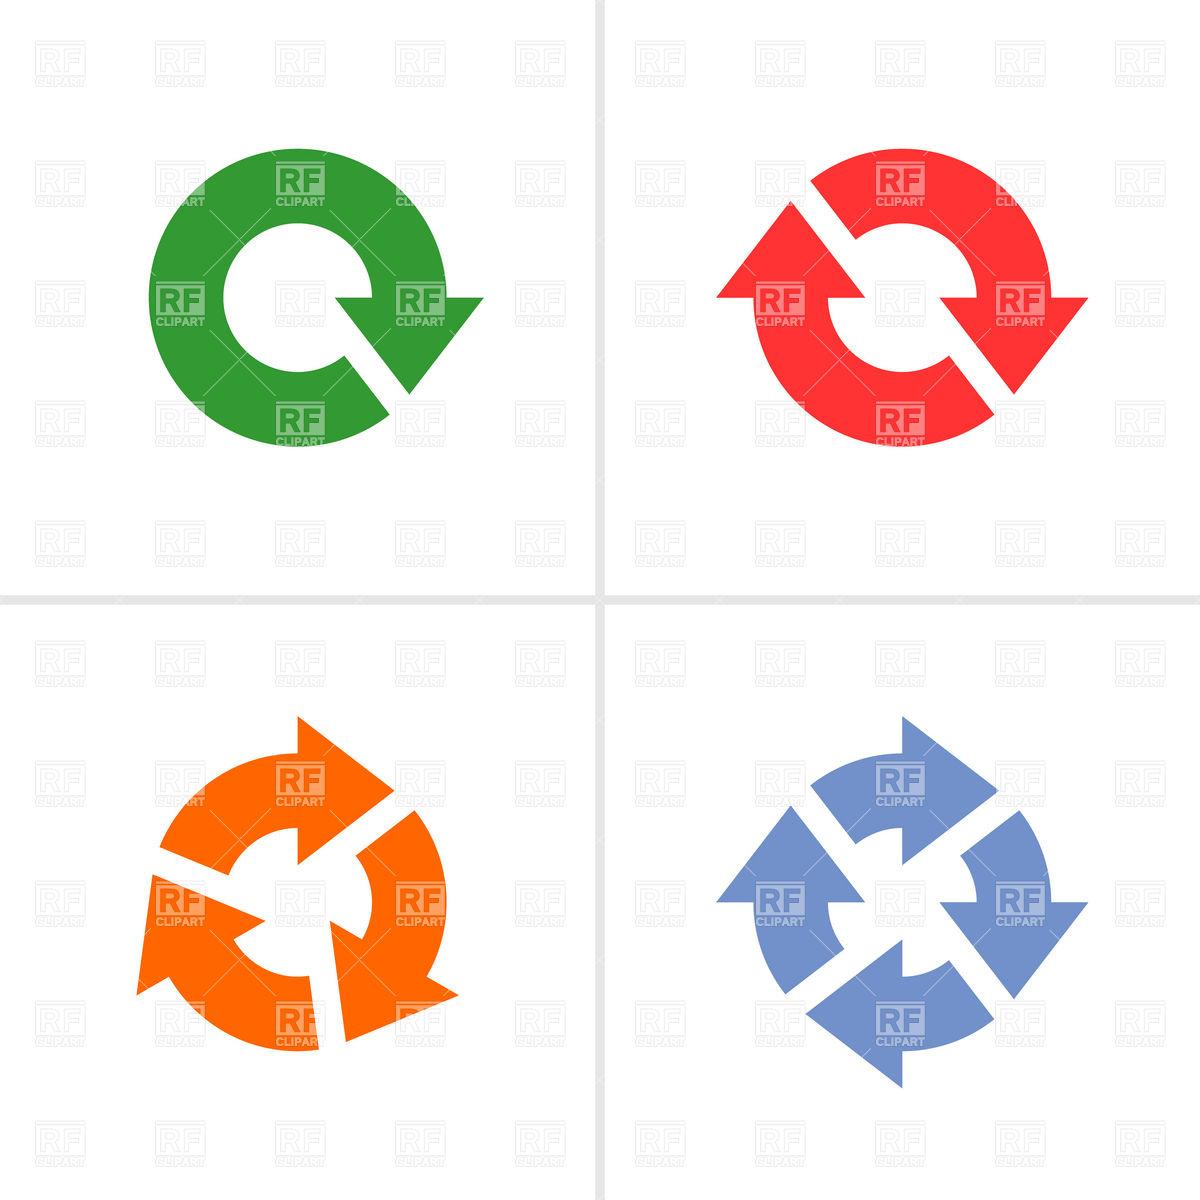 Simple color rotation arrows Vector Image #12688.